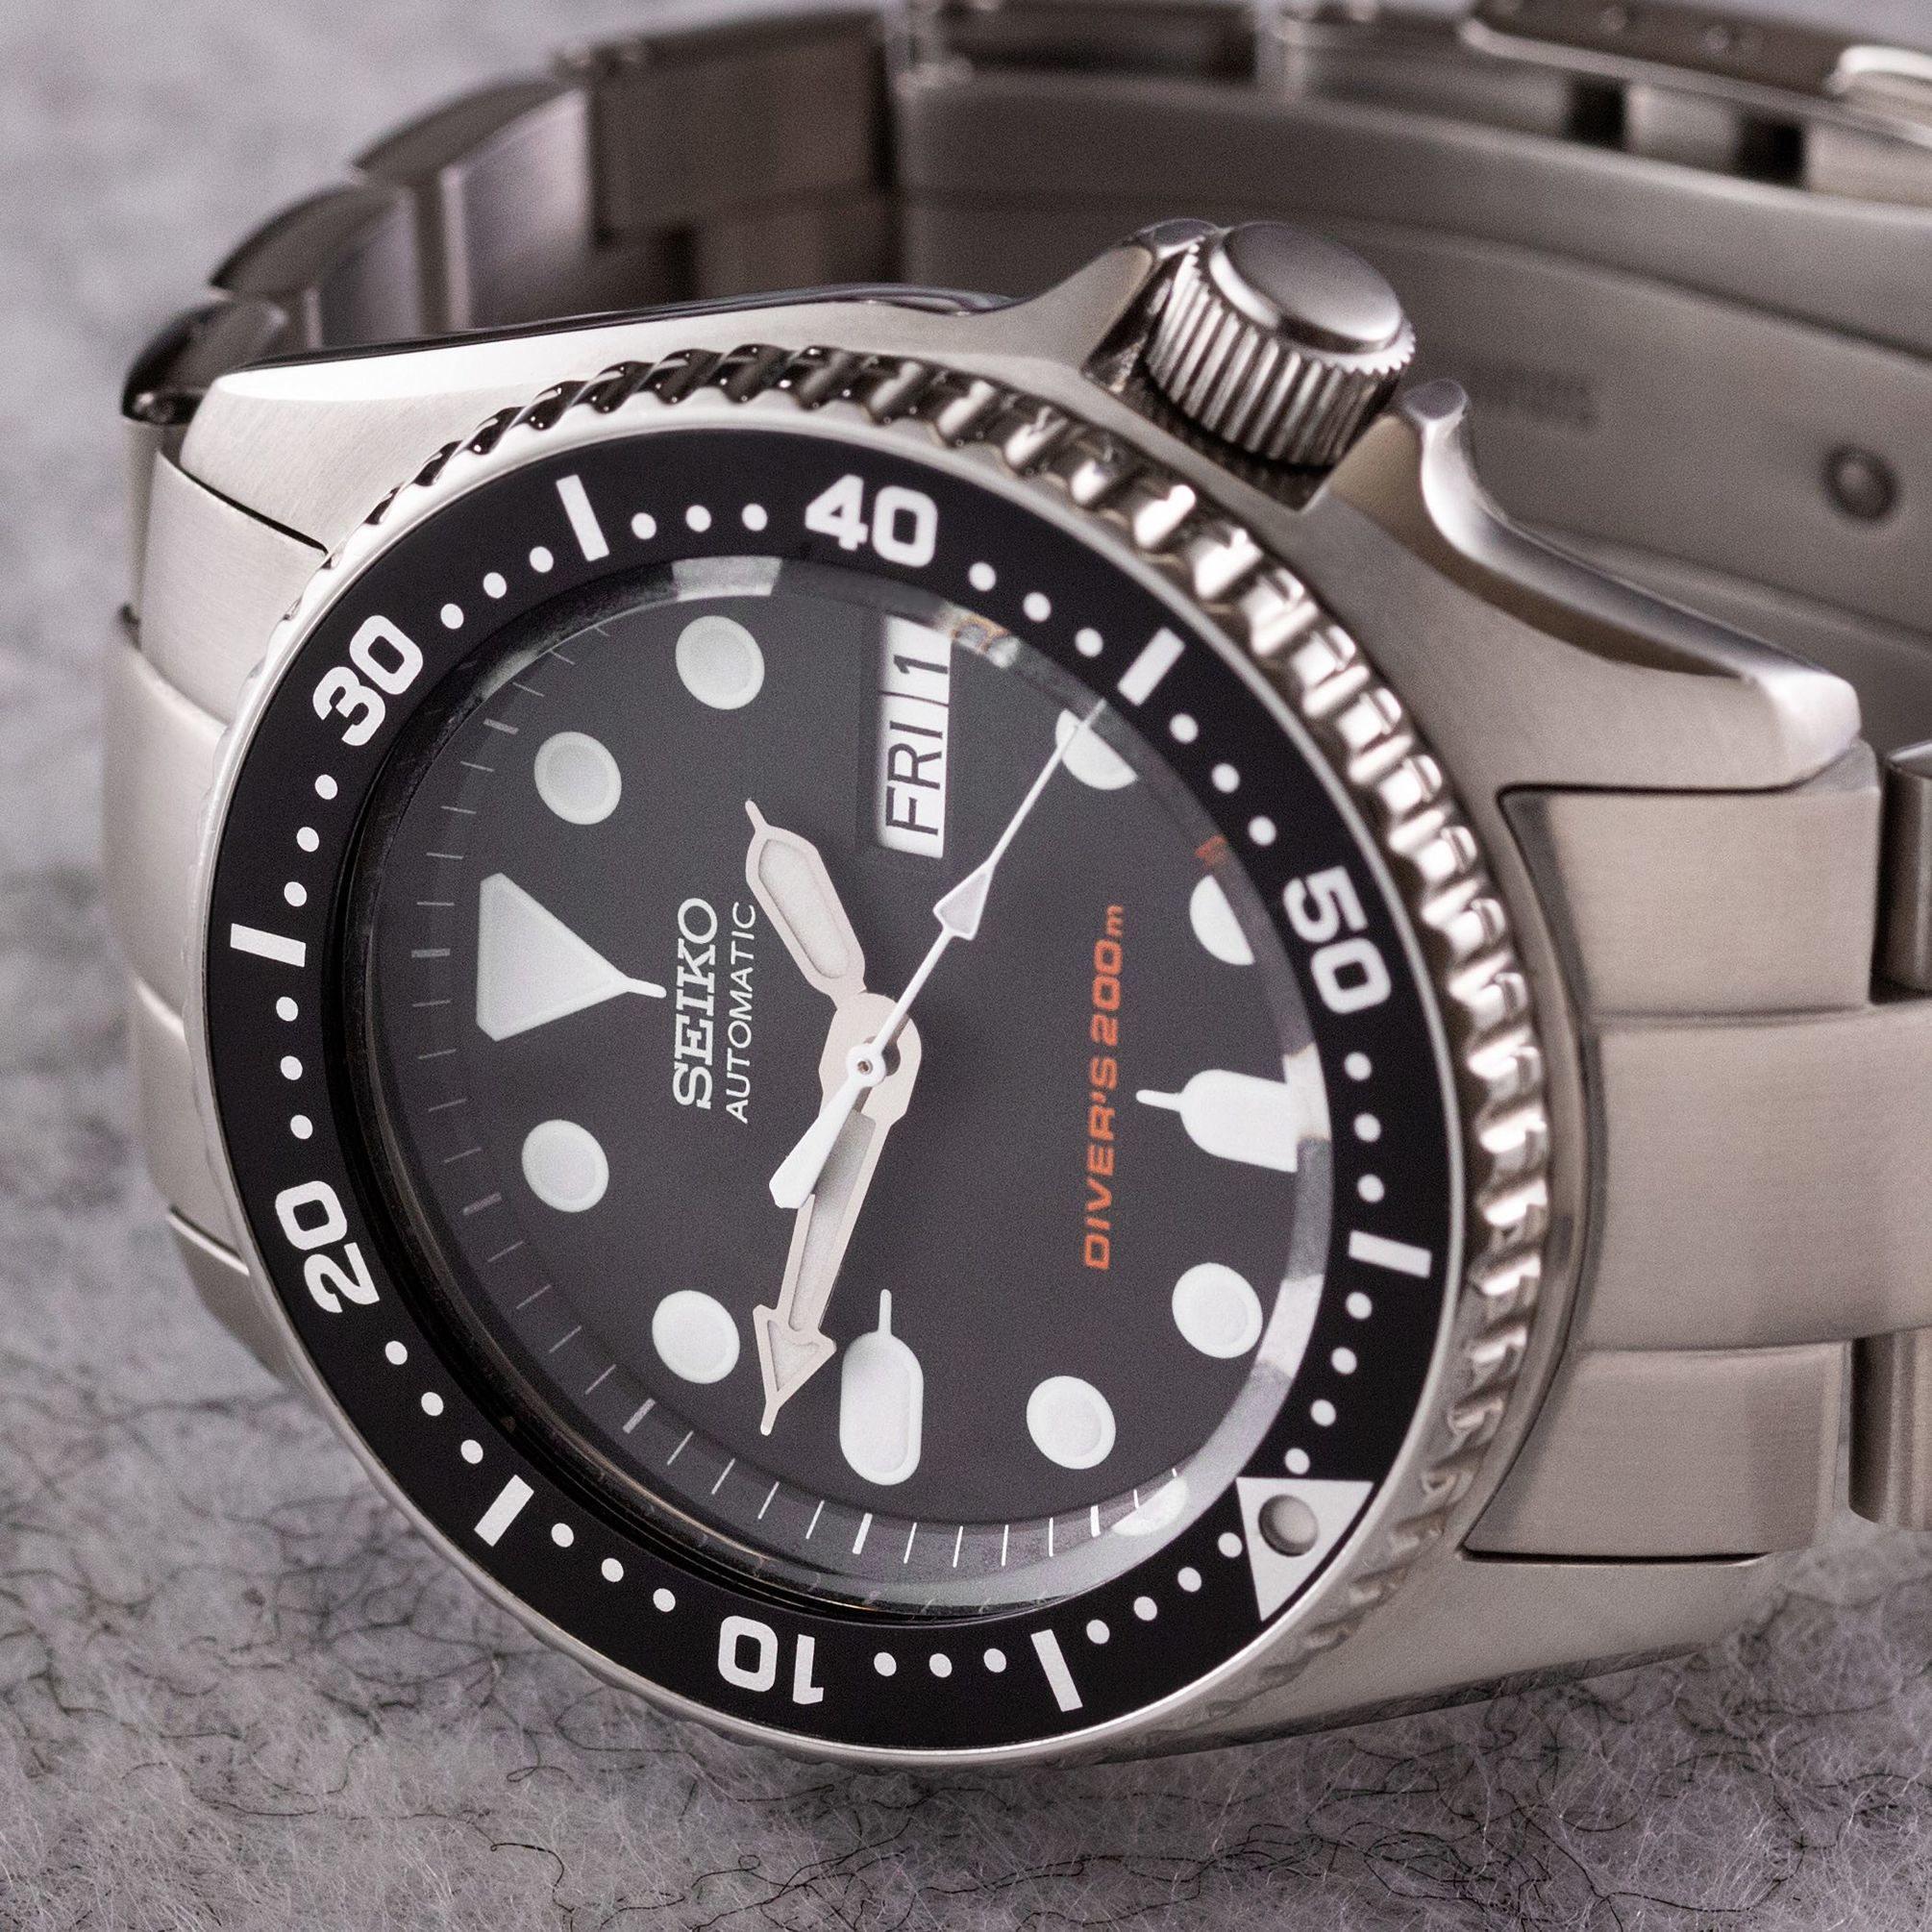 Seiko SKX013 oyster bracelet - The Modest Man - crop